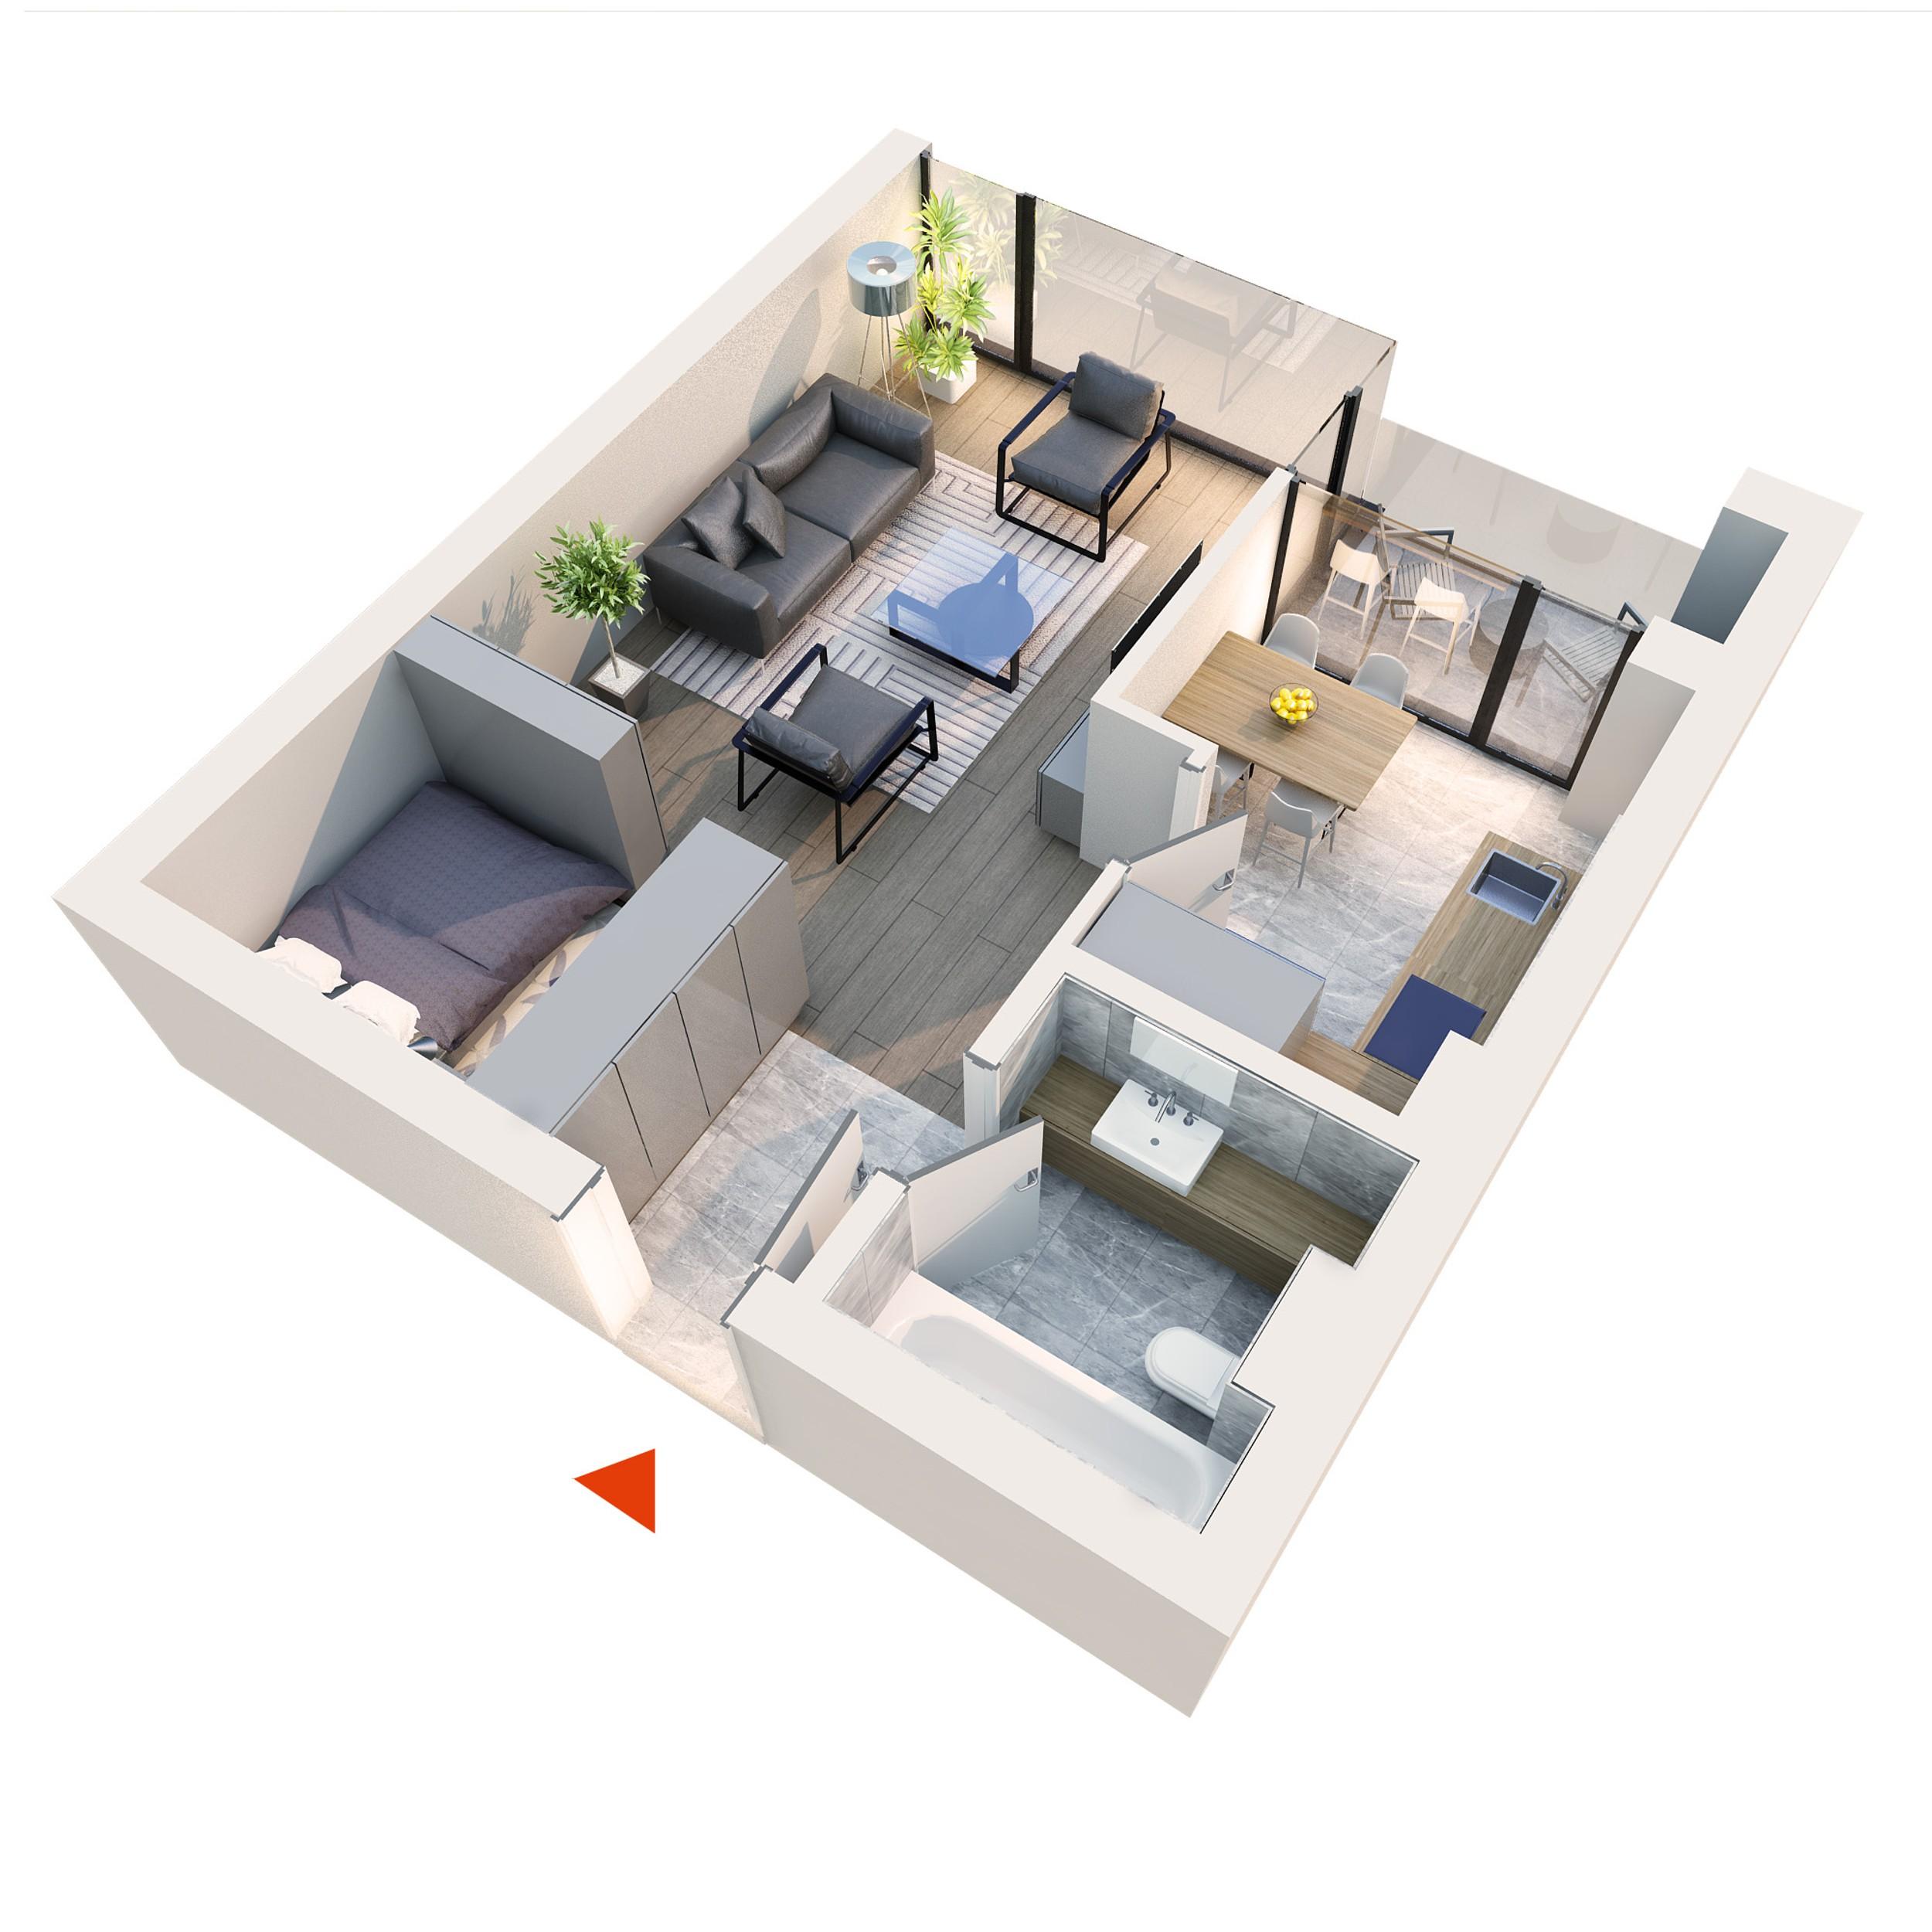 Apartament Studio tip 1E1 | Balcon | Etaj 5 | Corp C7 C8 | Faza 2